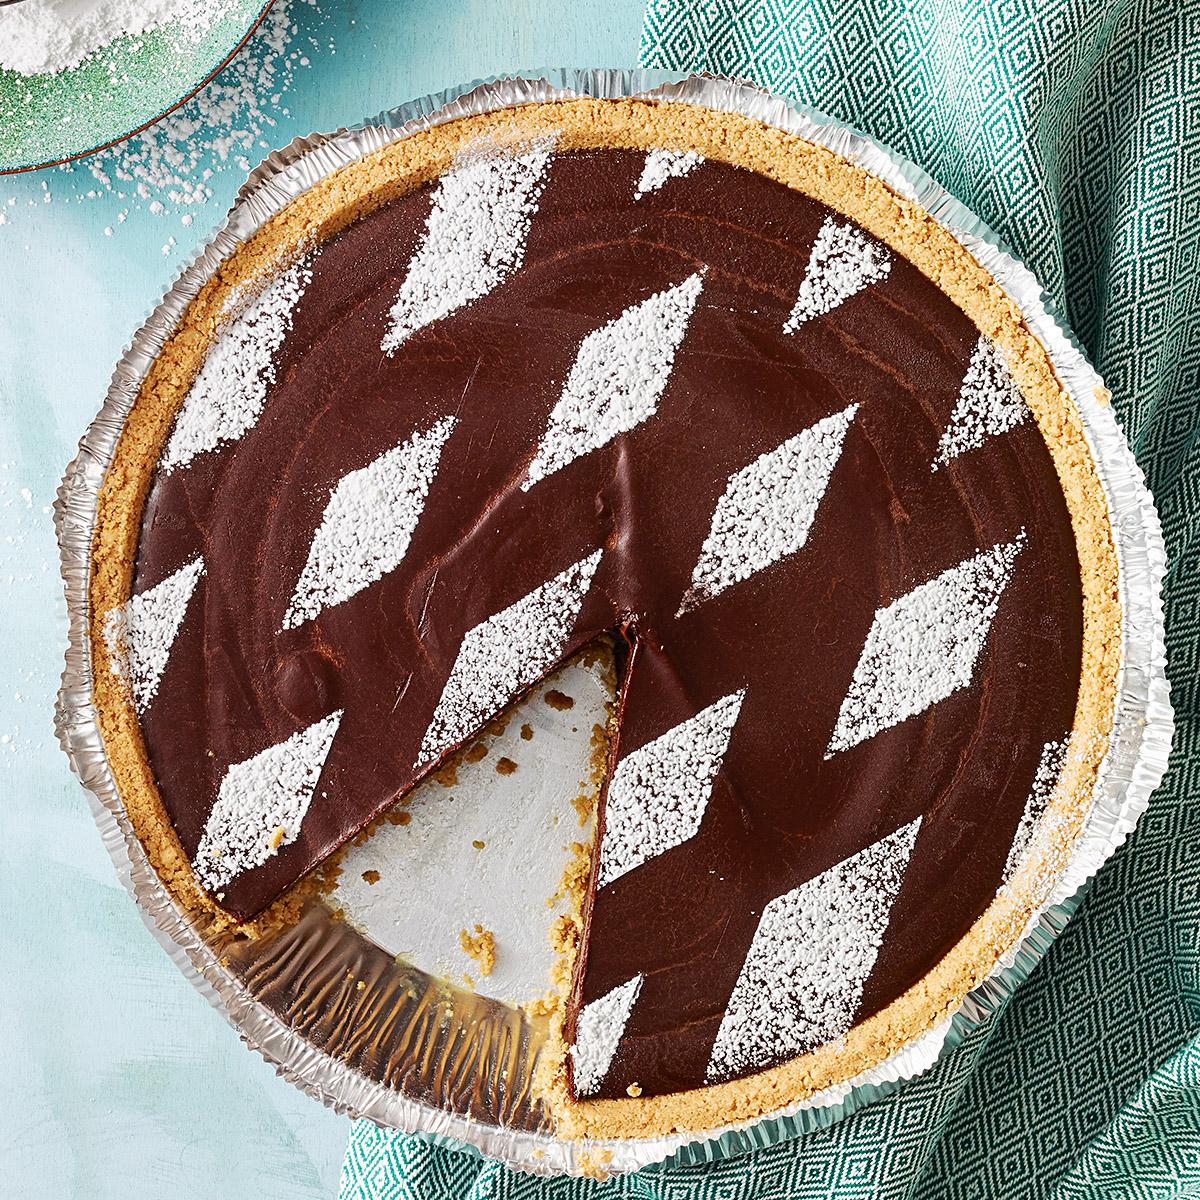 Mocha-Maple Pie